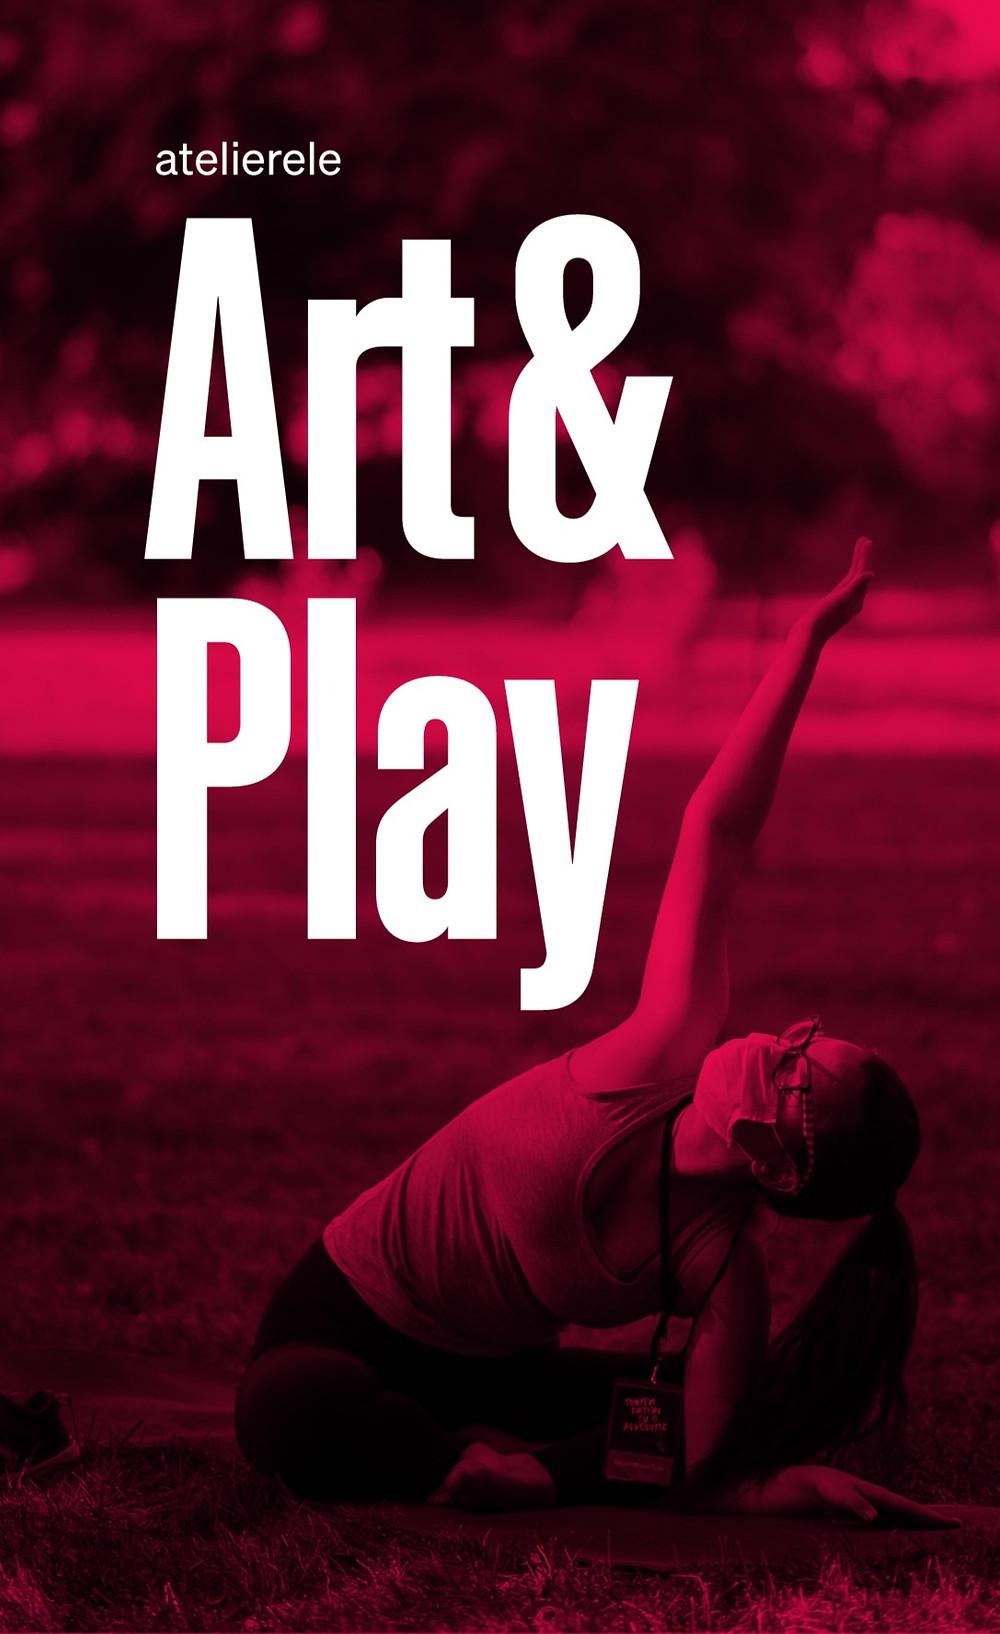 atelierele Art&Play, Ideo Ideis Festivalul #16, cover image